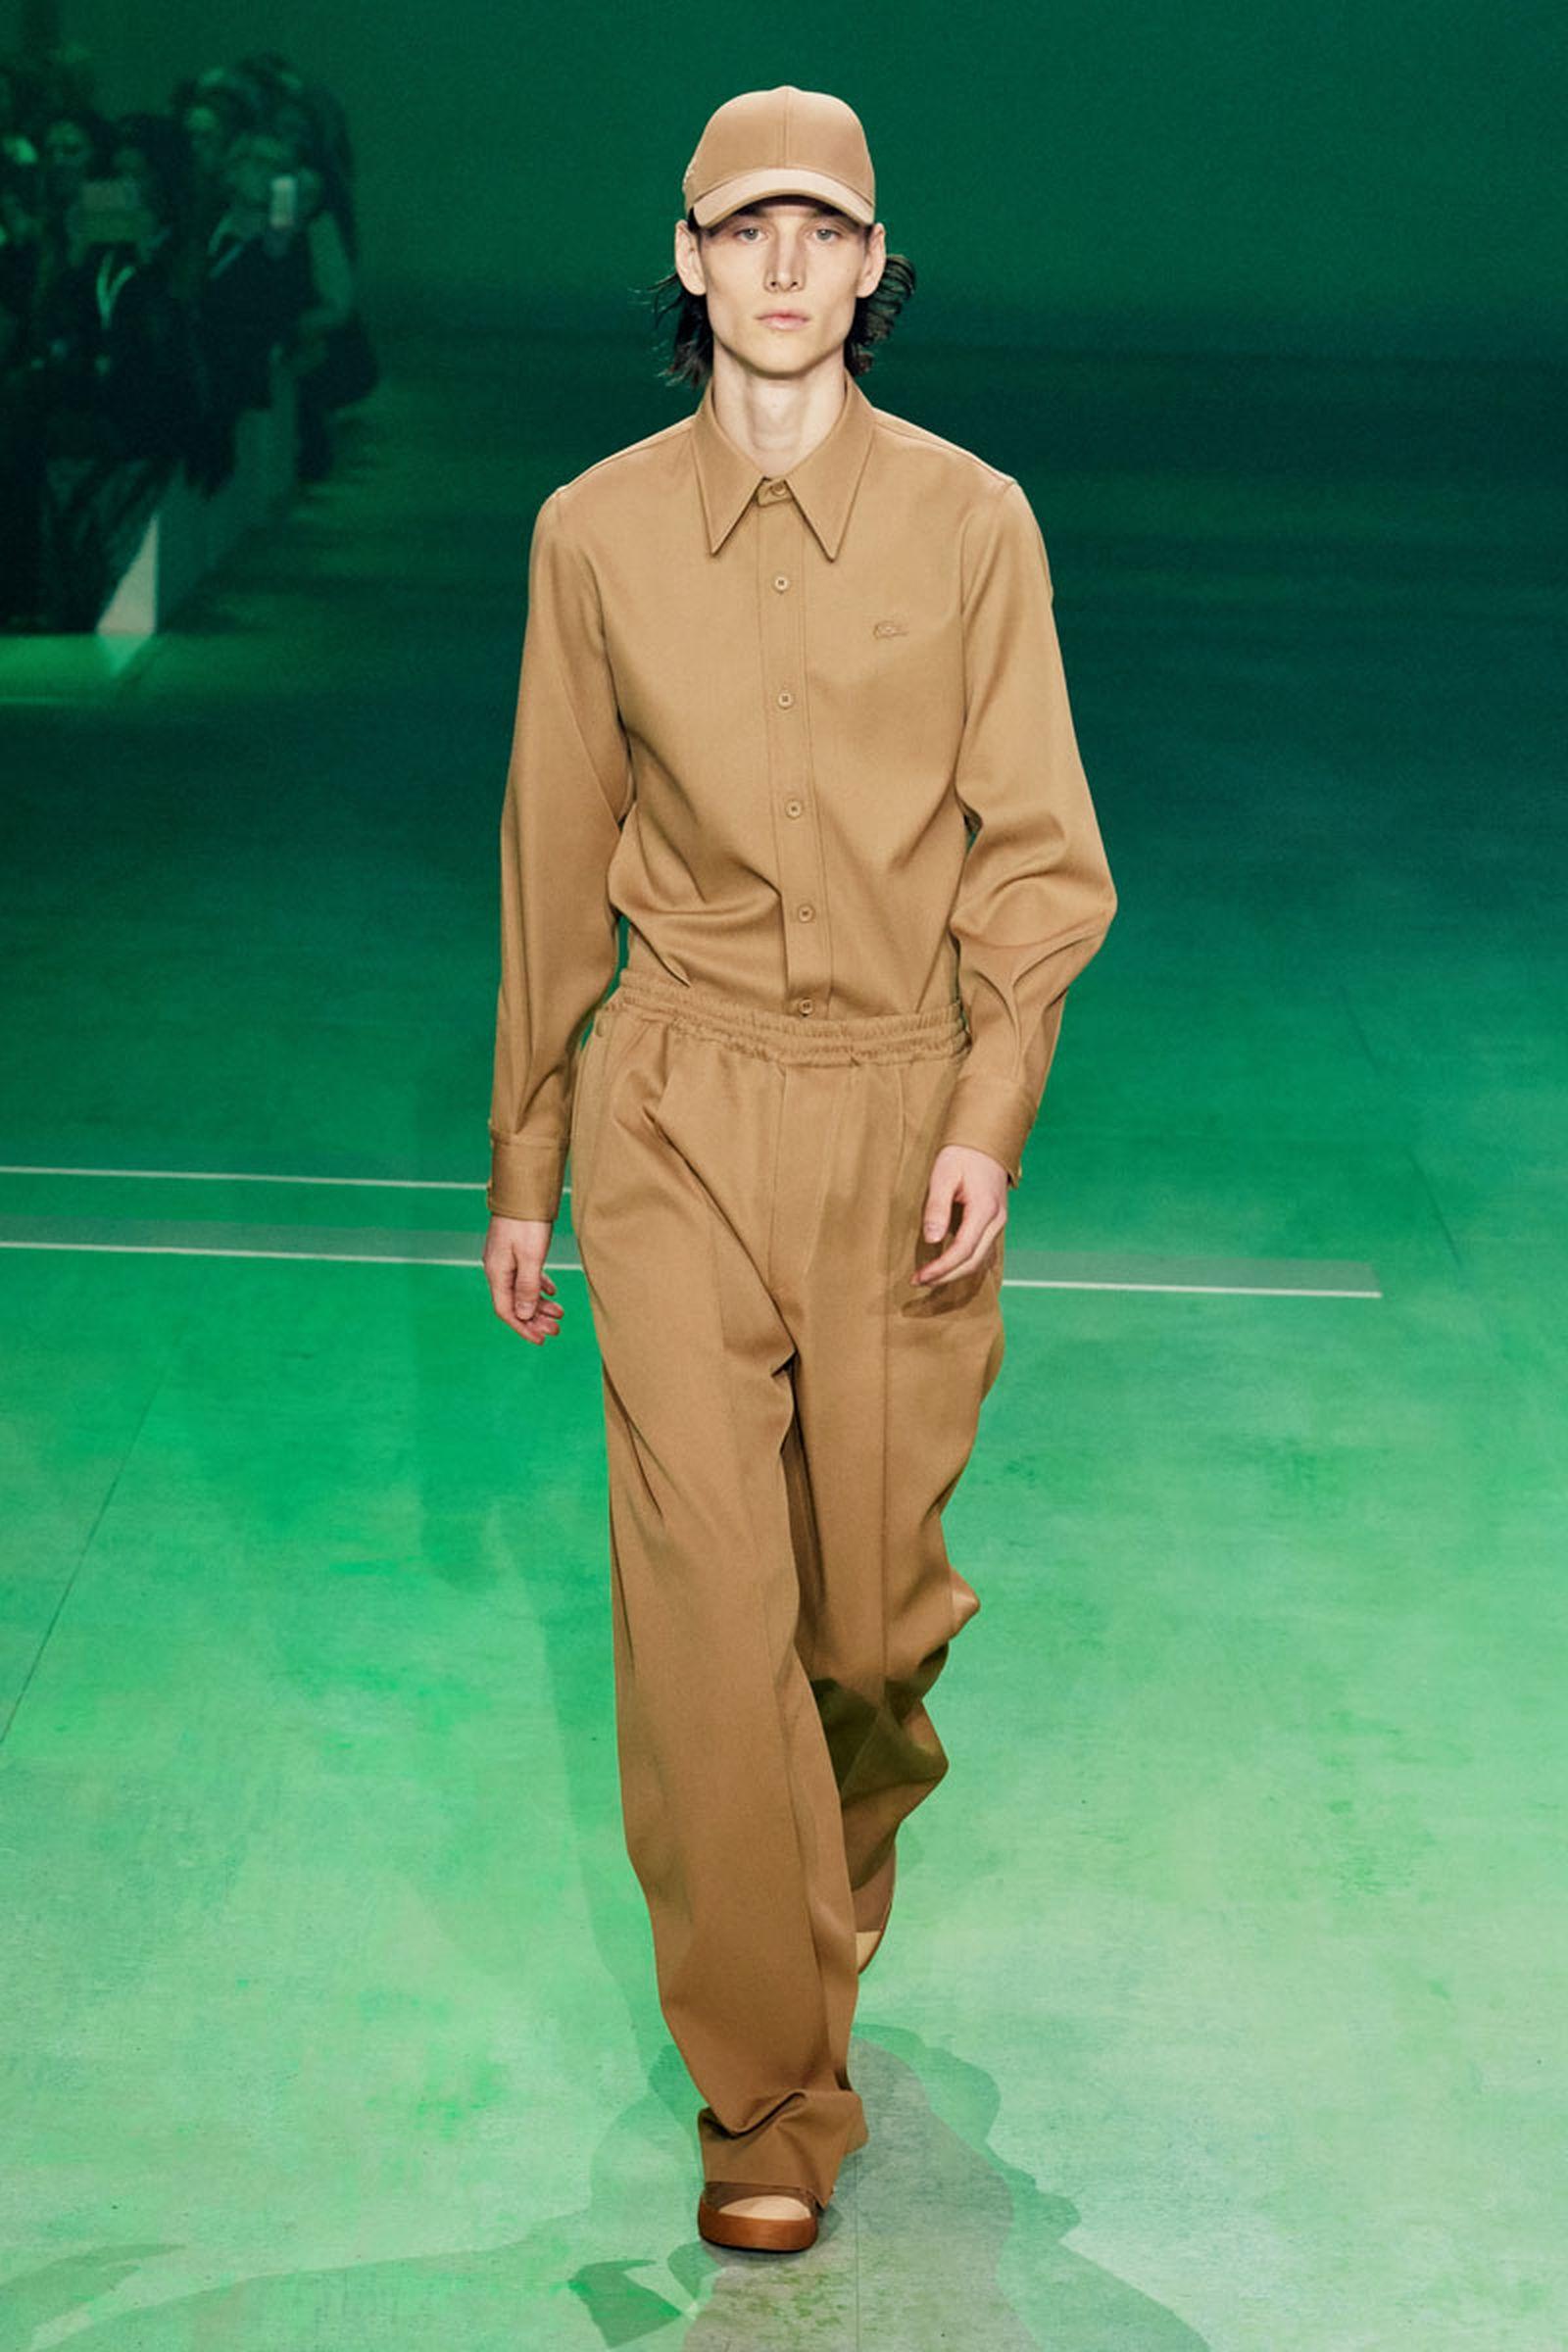 2lascoste fw19 paris fashion week Louise Trotter lacoste runway